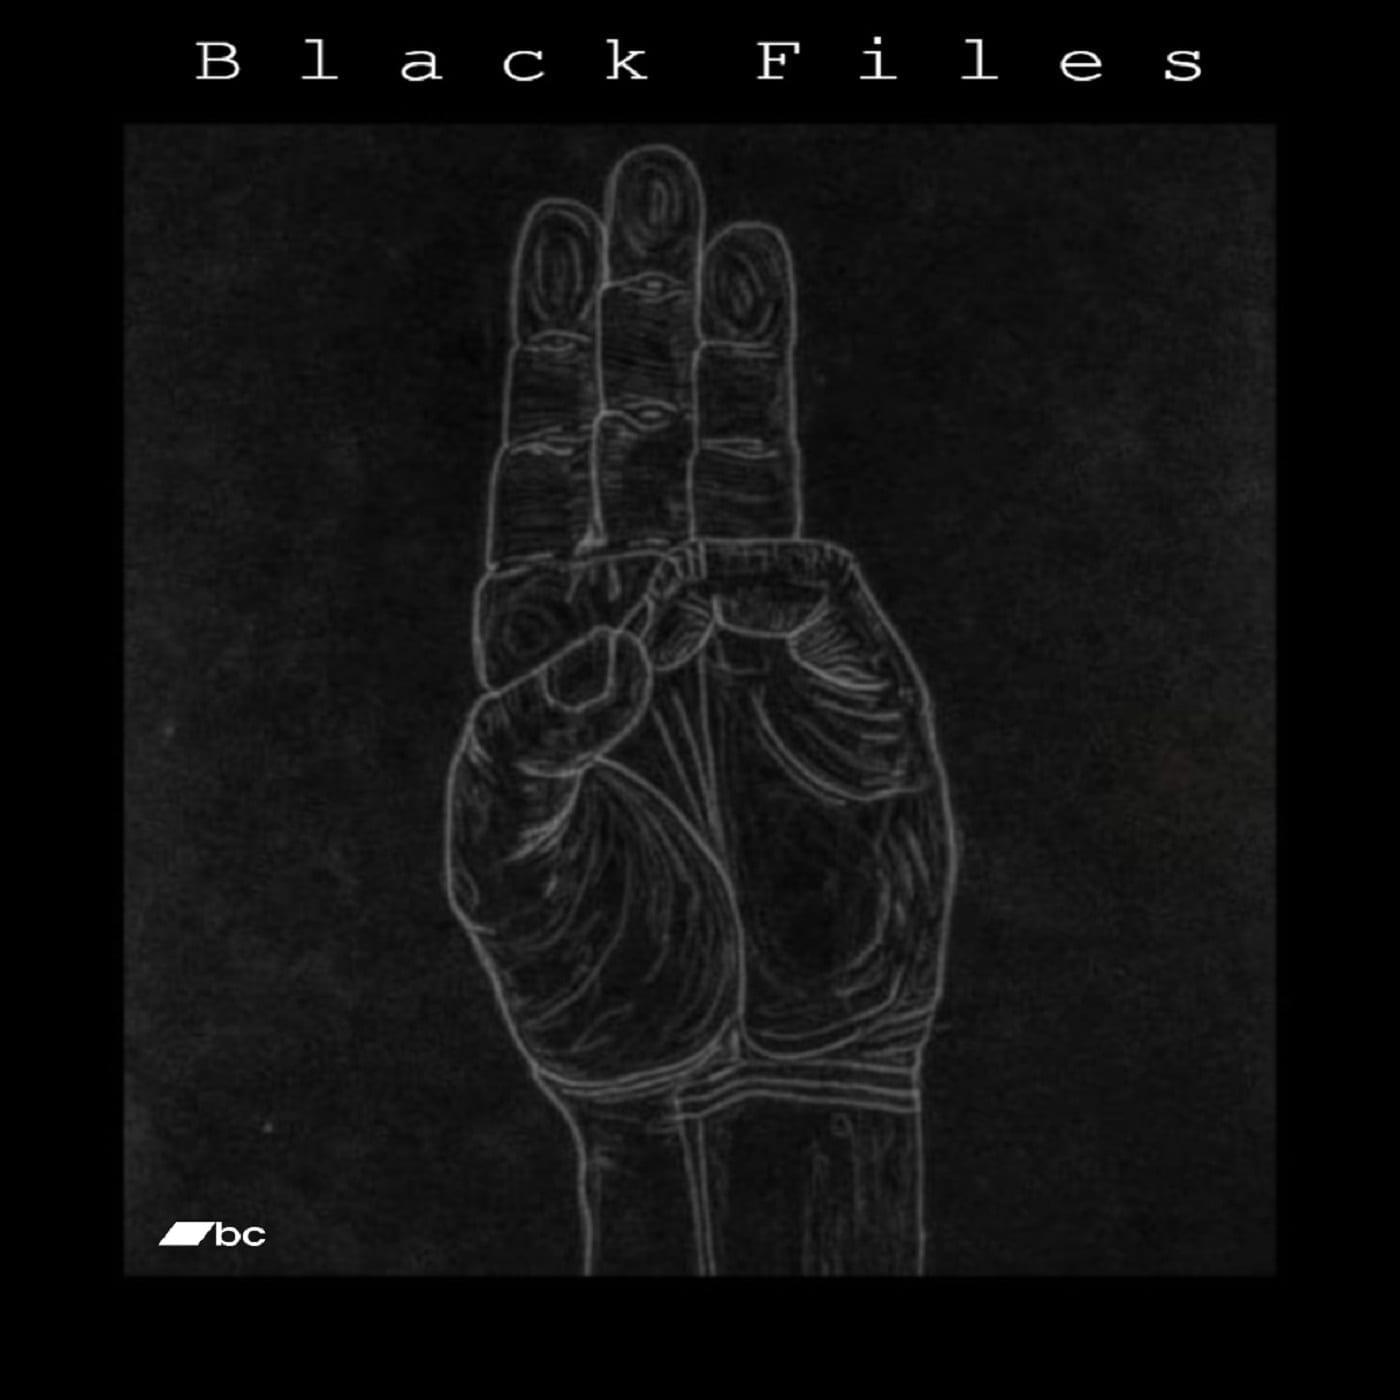 Vladimr Marinkovic - Black Files (Single)